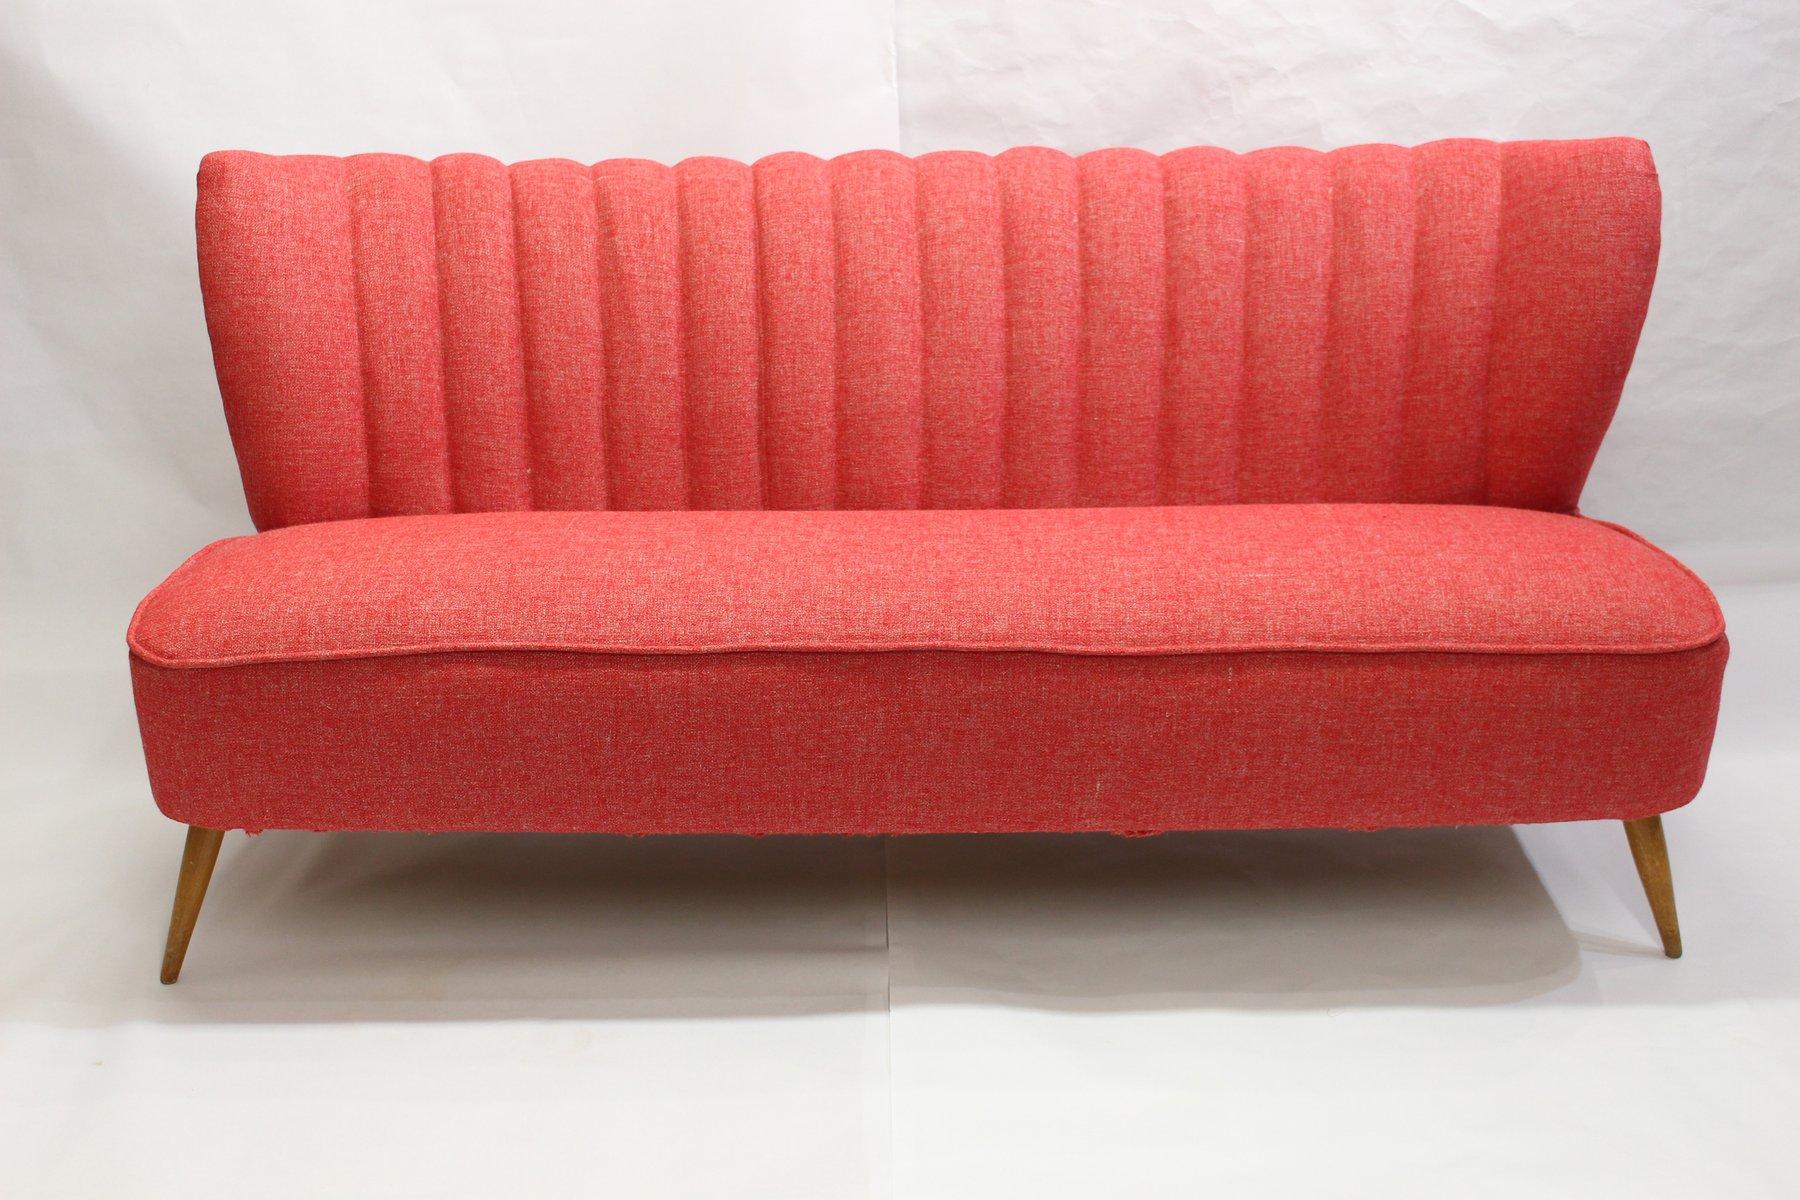 rotes vintage drei sitzer sofa bei pamono kaufen. Black Bedroom Furniture Sets. Home Design Ideas